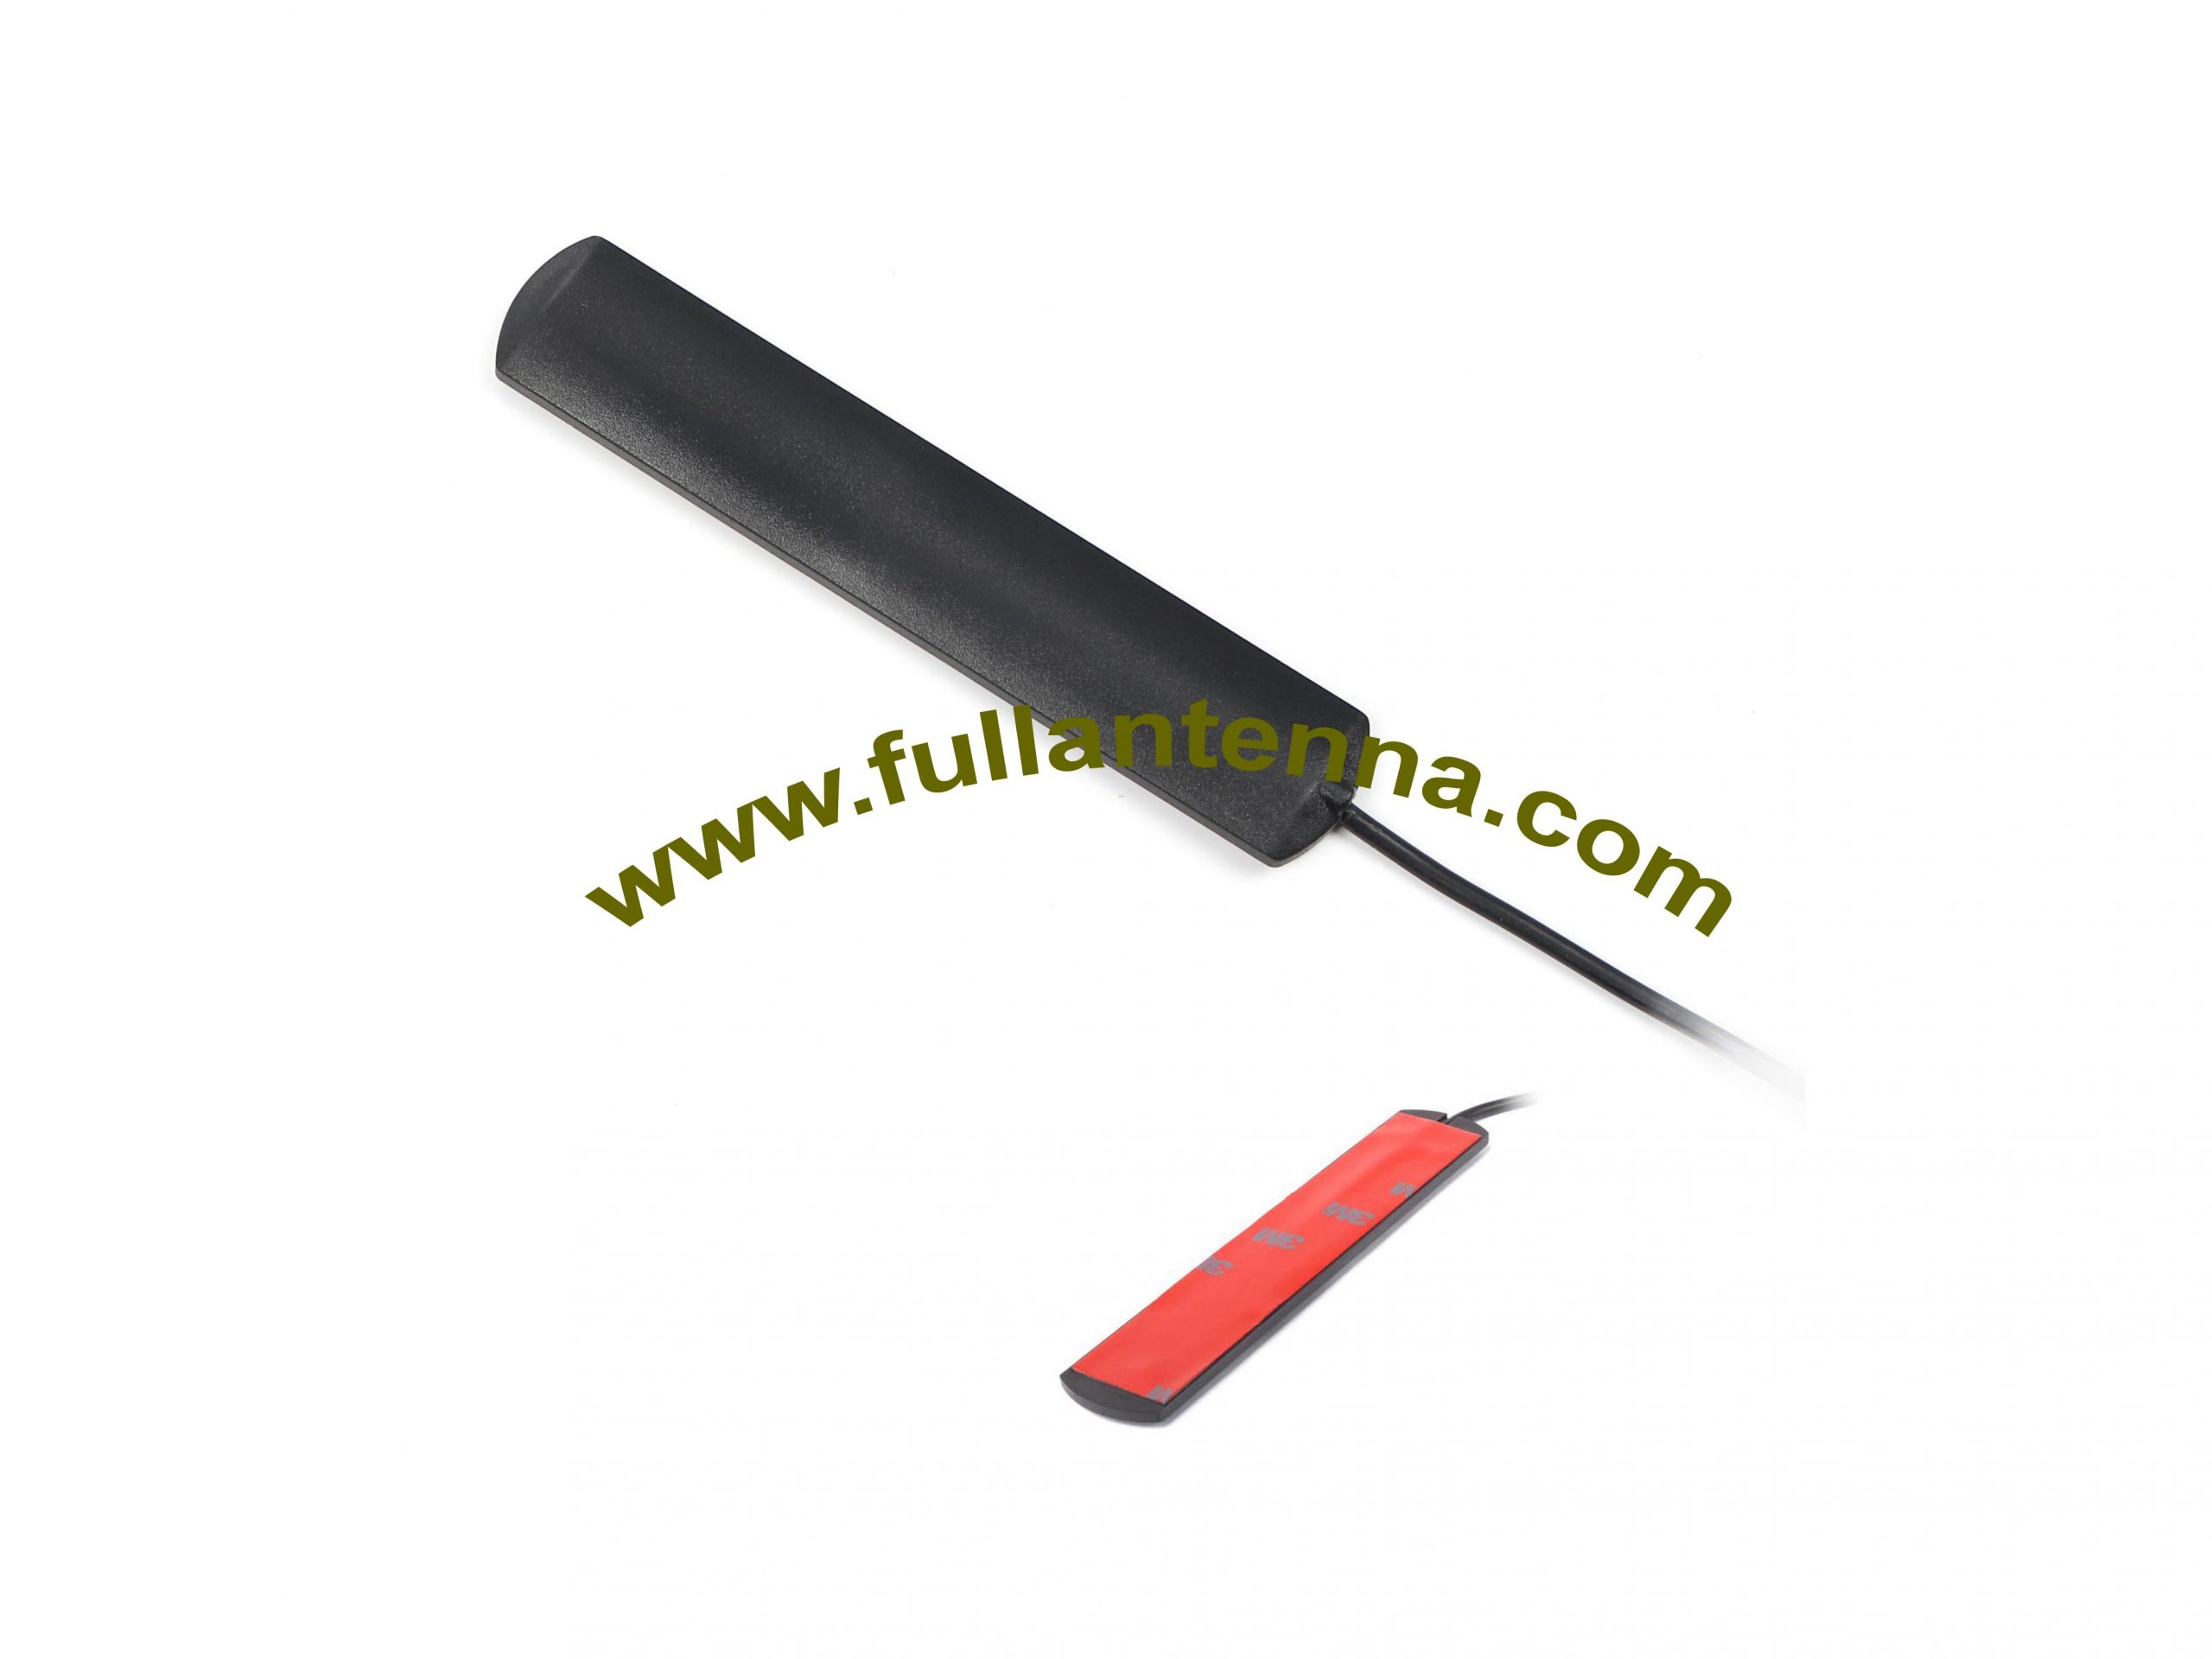 P/N:FA2400.04,WiFi/2.4G External Antenna,patch antenna adhesive mount,easy mount 3M sticker